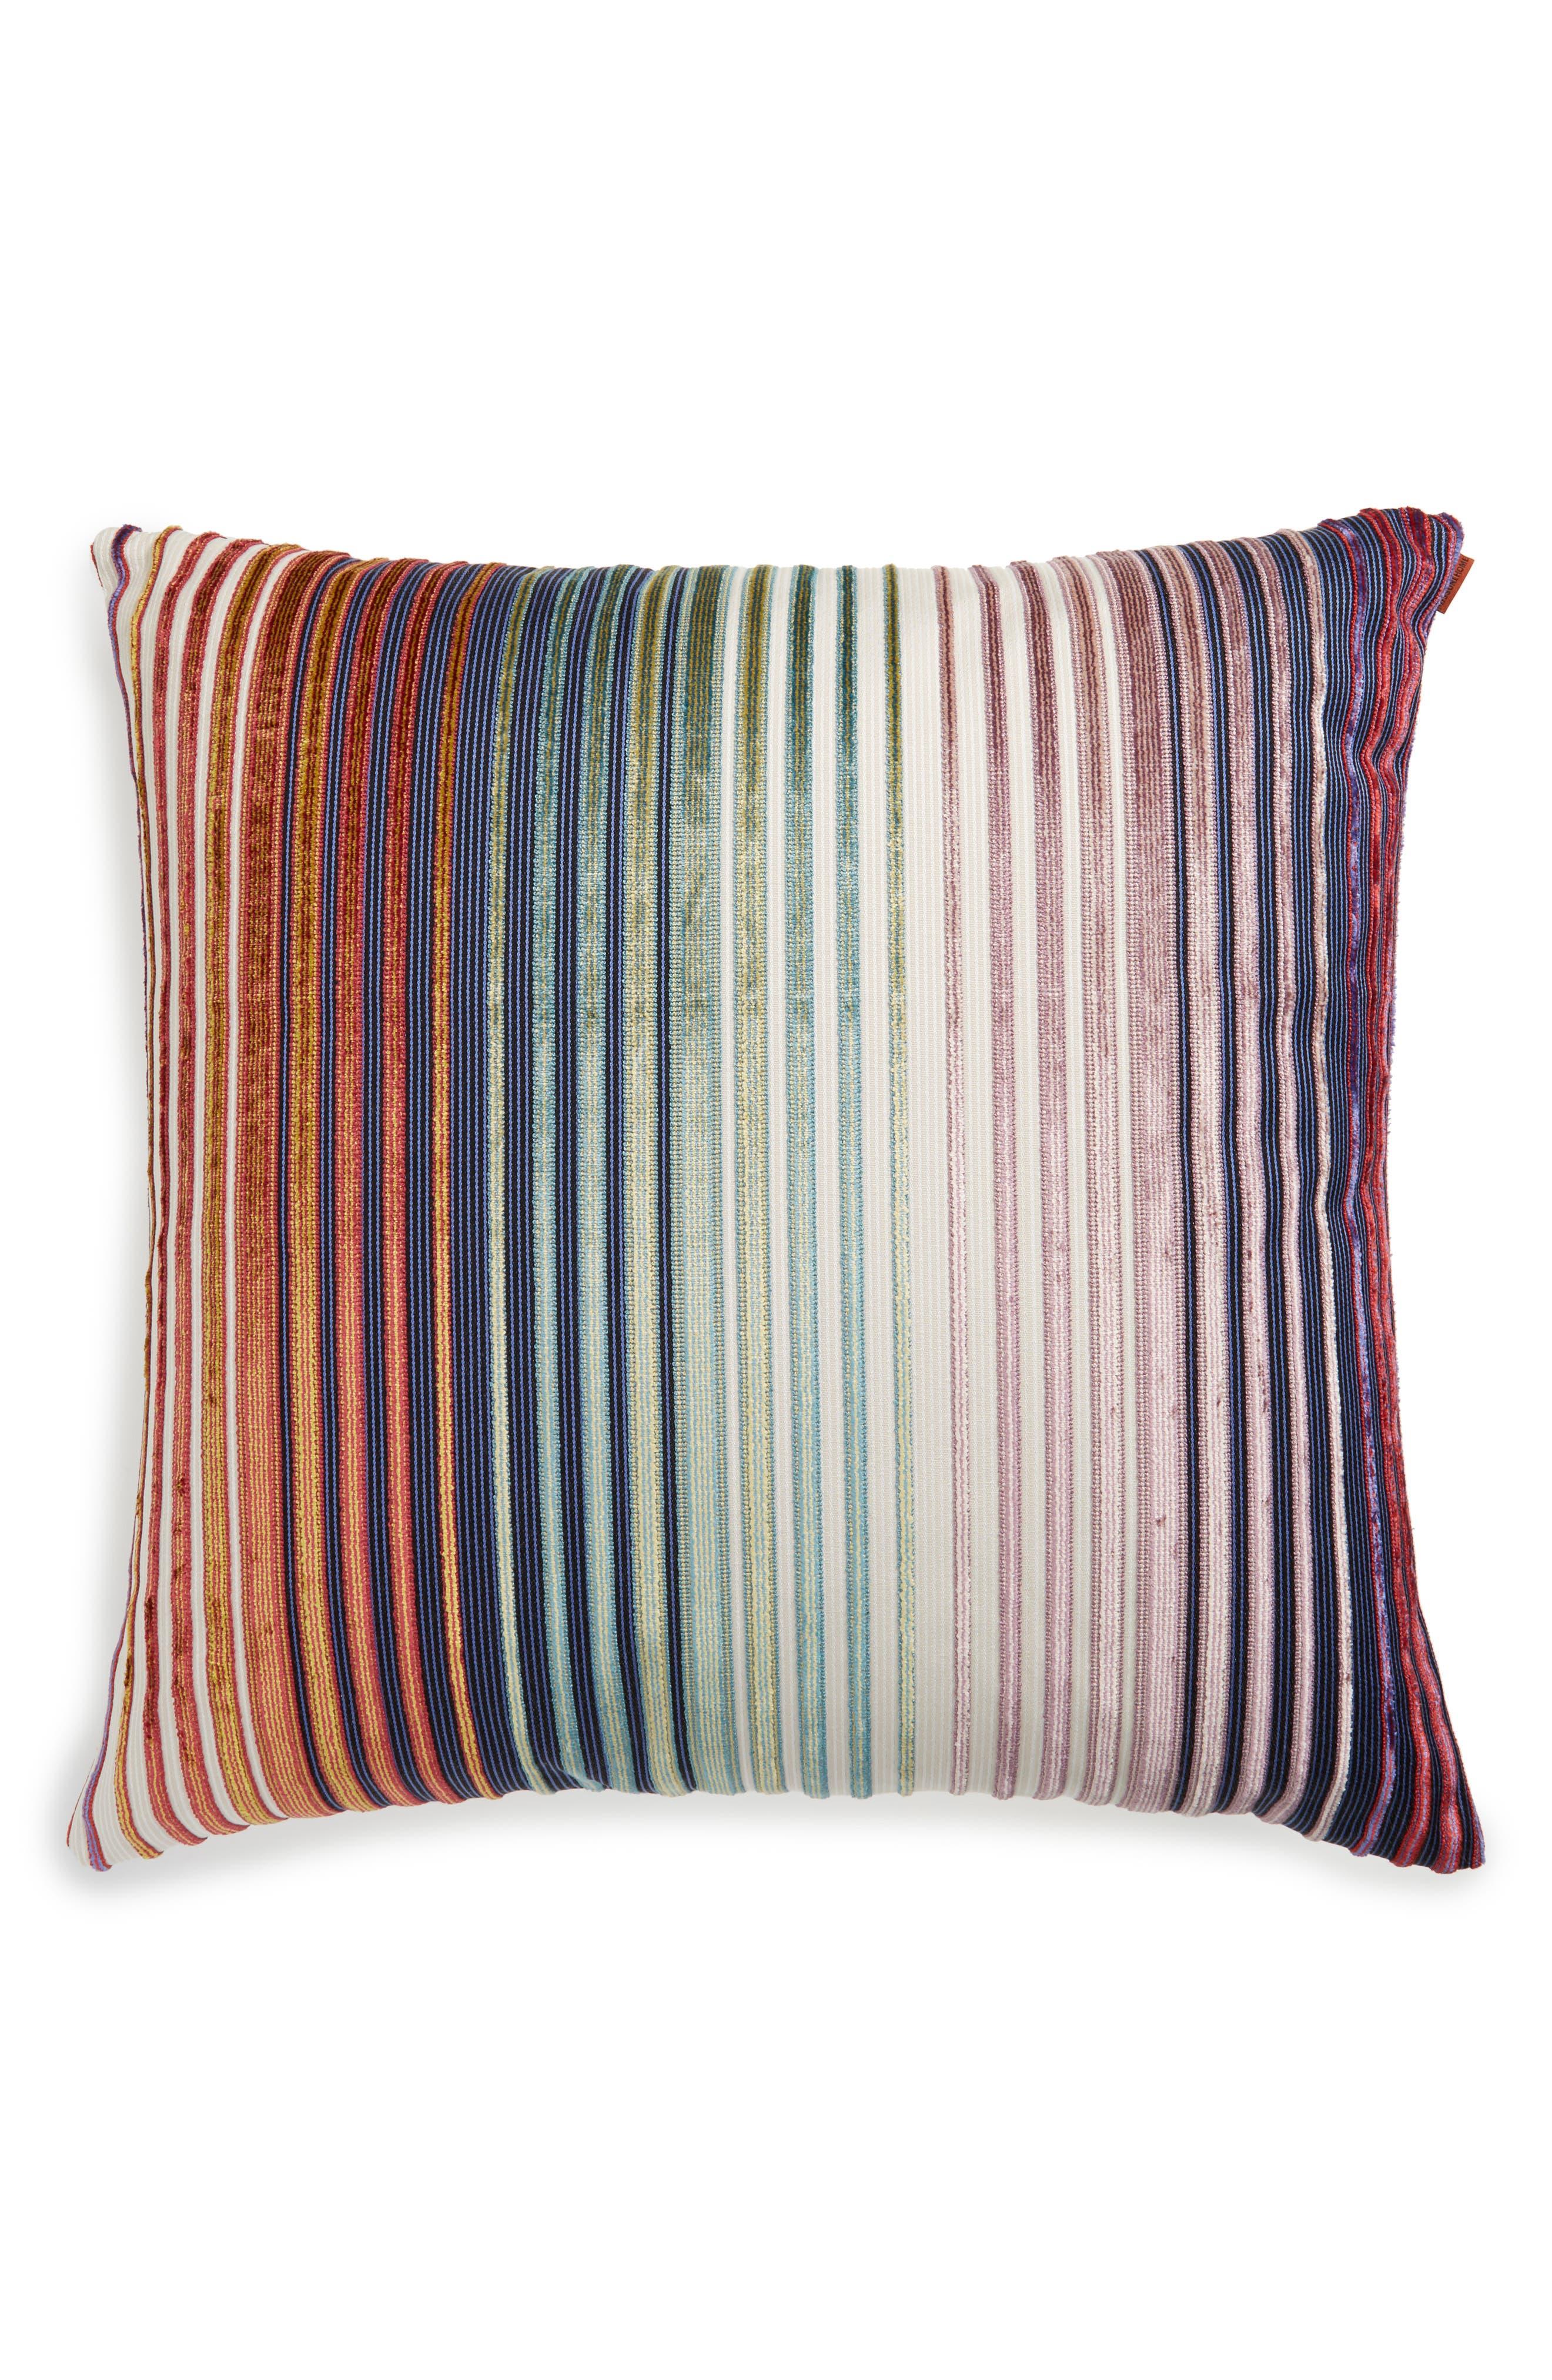 Tunisi Accent Pillow,                             Alternate thumbnail 2, color,                             Multi Color